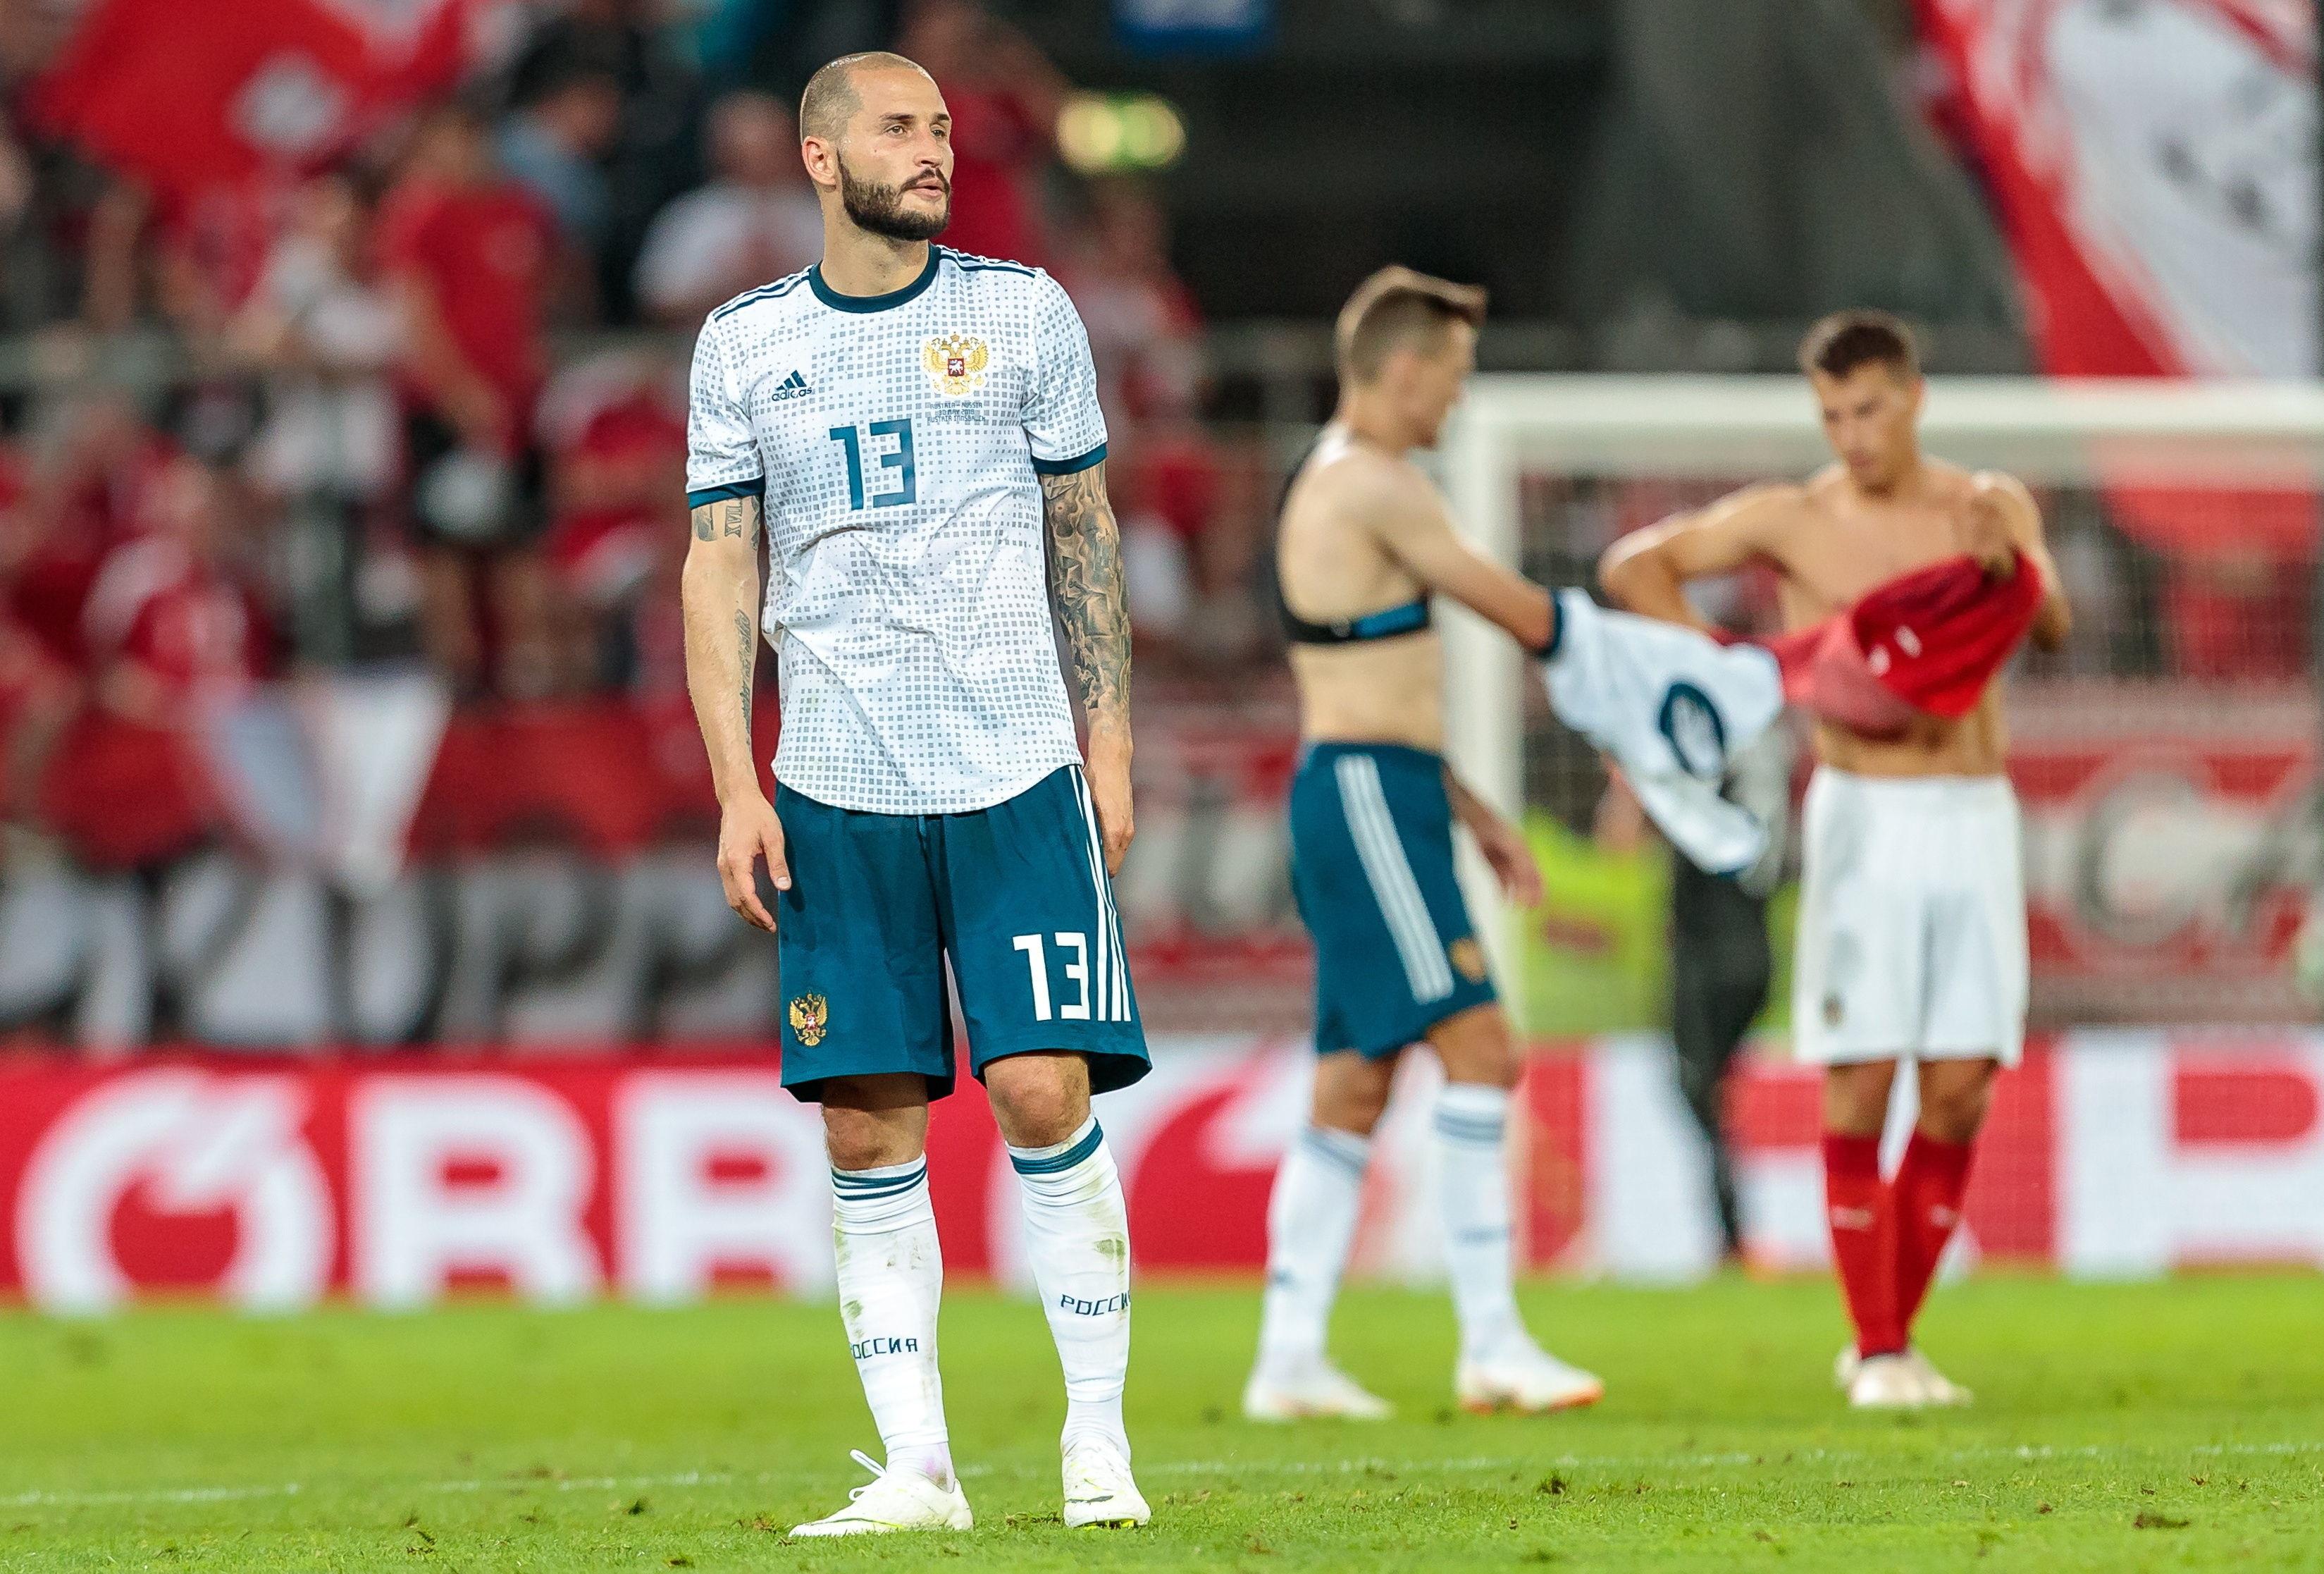 Rusia vs Austria partido de preparación